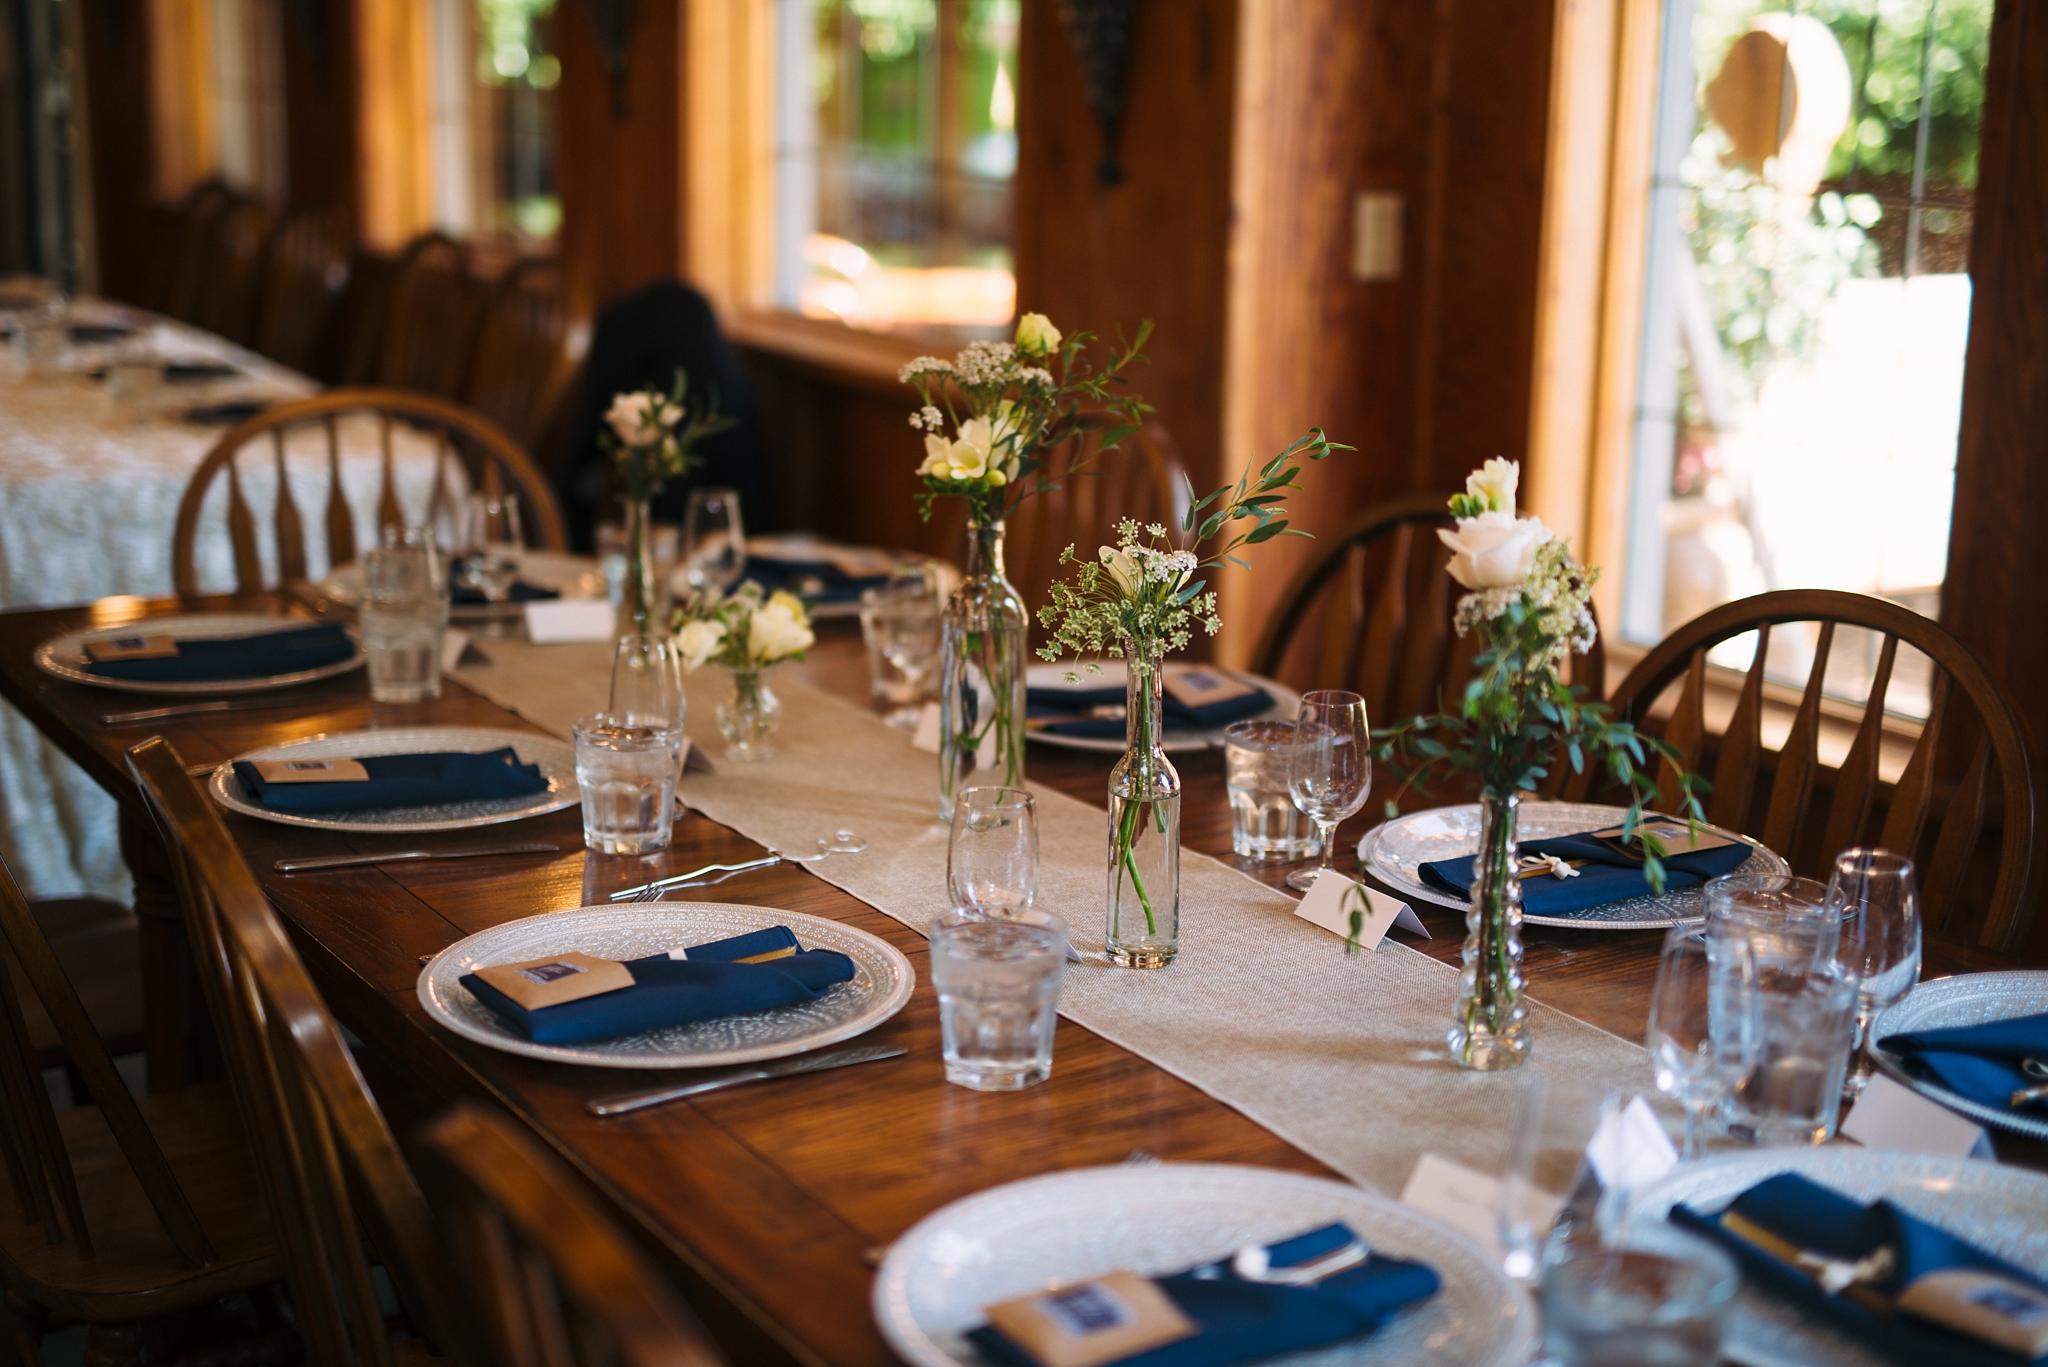 kaihla_tonai_intimate_wedding_elopement_photographer_4297